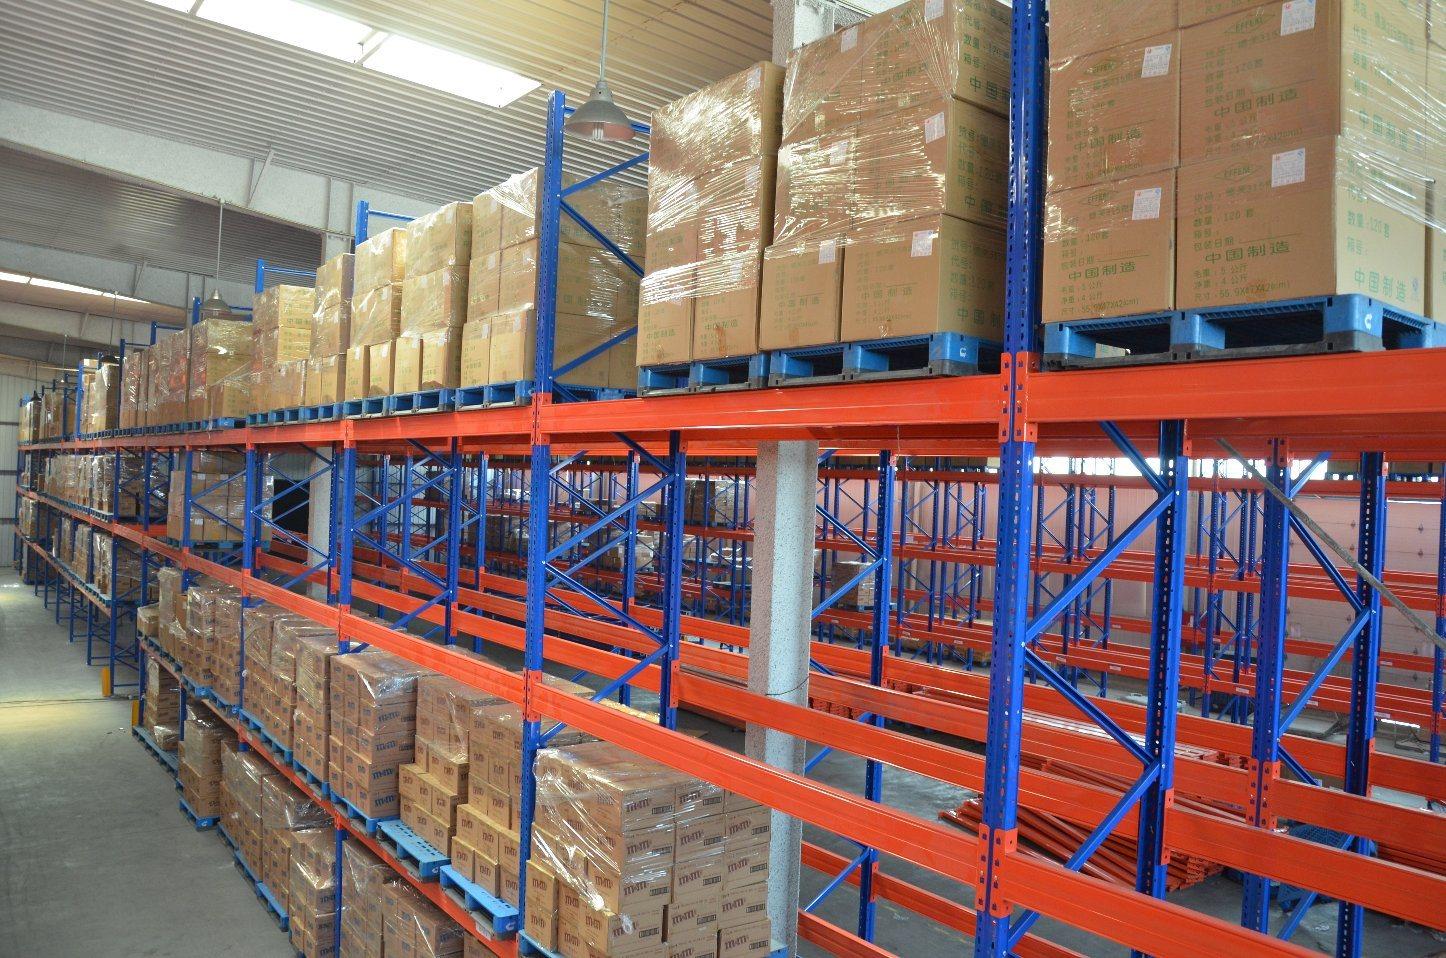 Hot Item Steel Heavy Duty Pallet Rack Industrial Rack And Shelving Warehouse Shelving Units